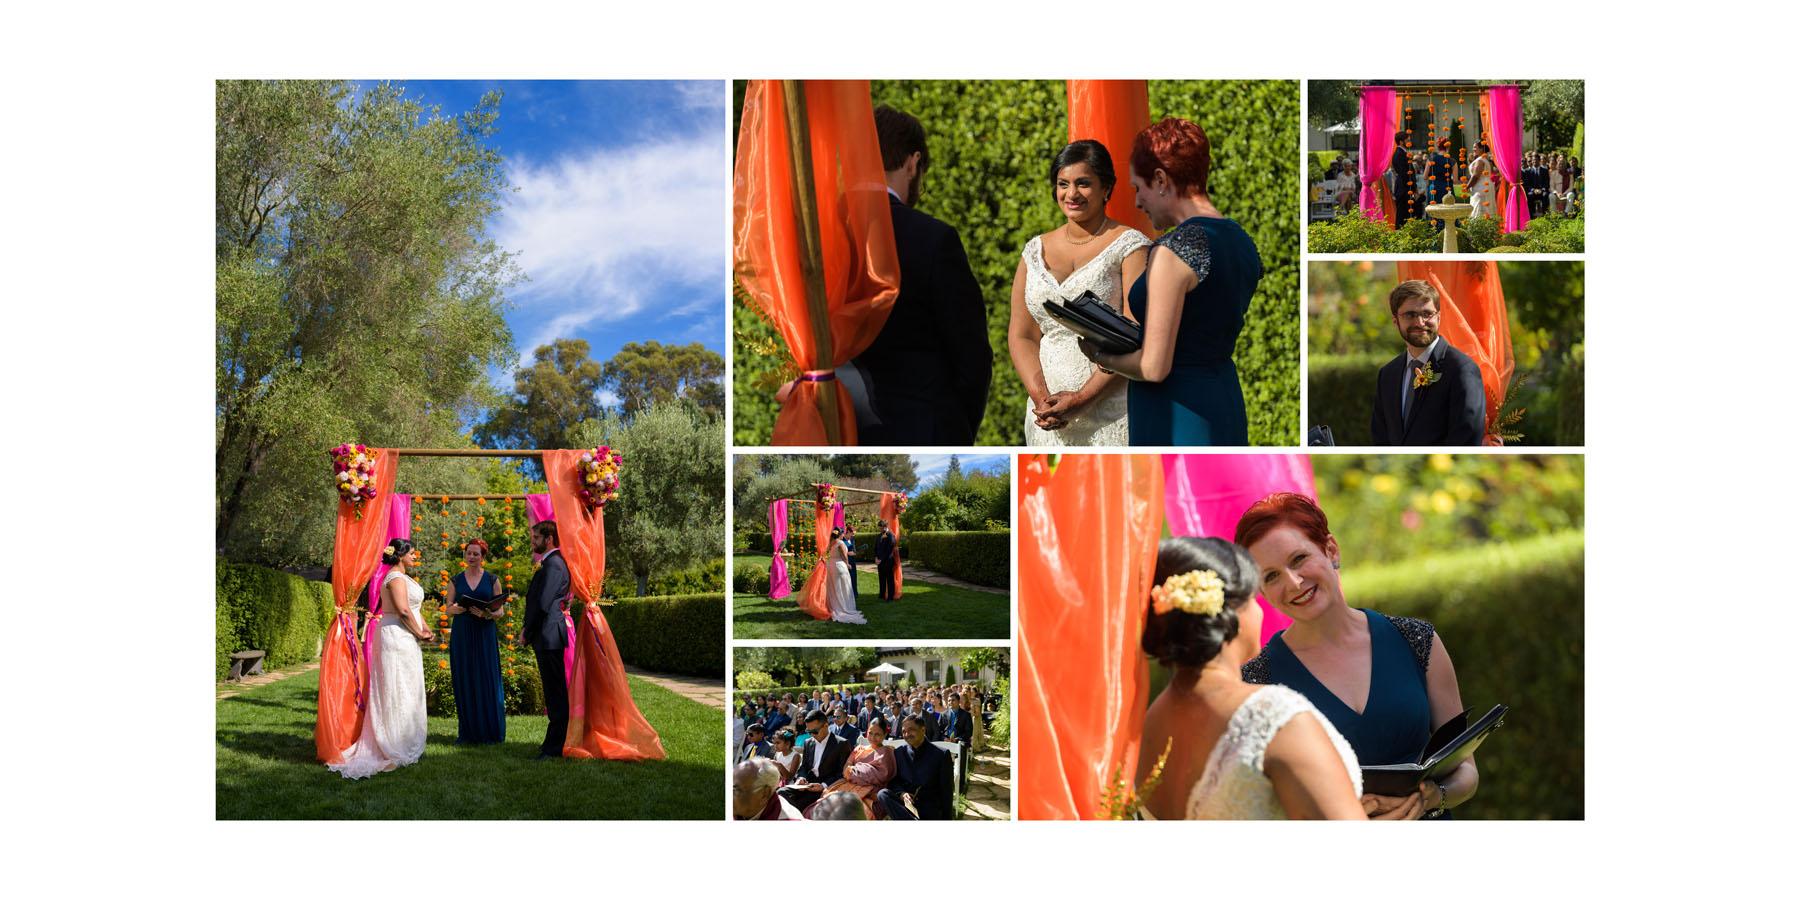 outdoor wedding ceremony –Allied Arts Guild –Menlo Park wedding photos –by Bay Area wedding photographer Chris Schmauch